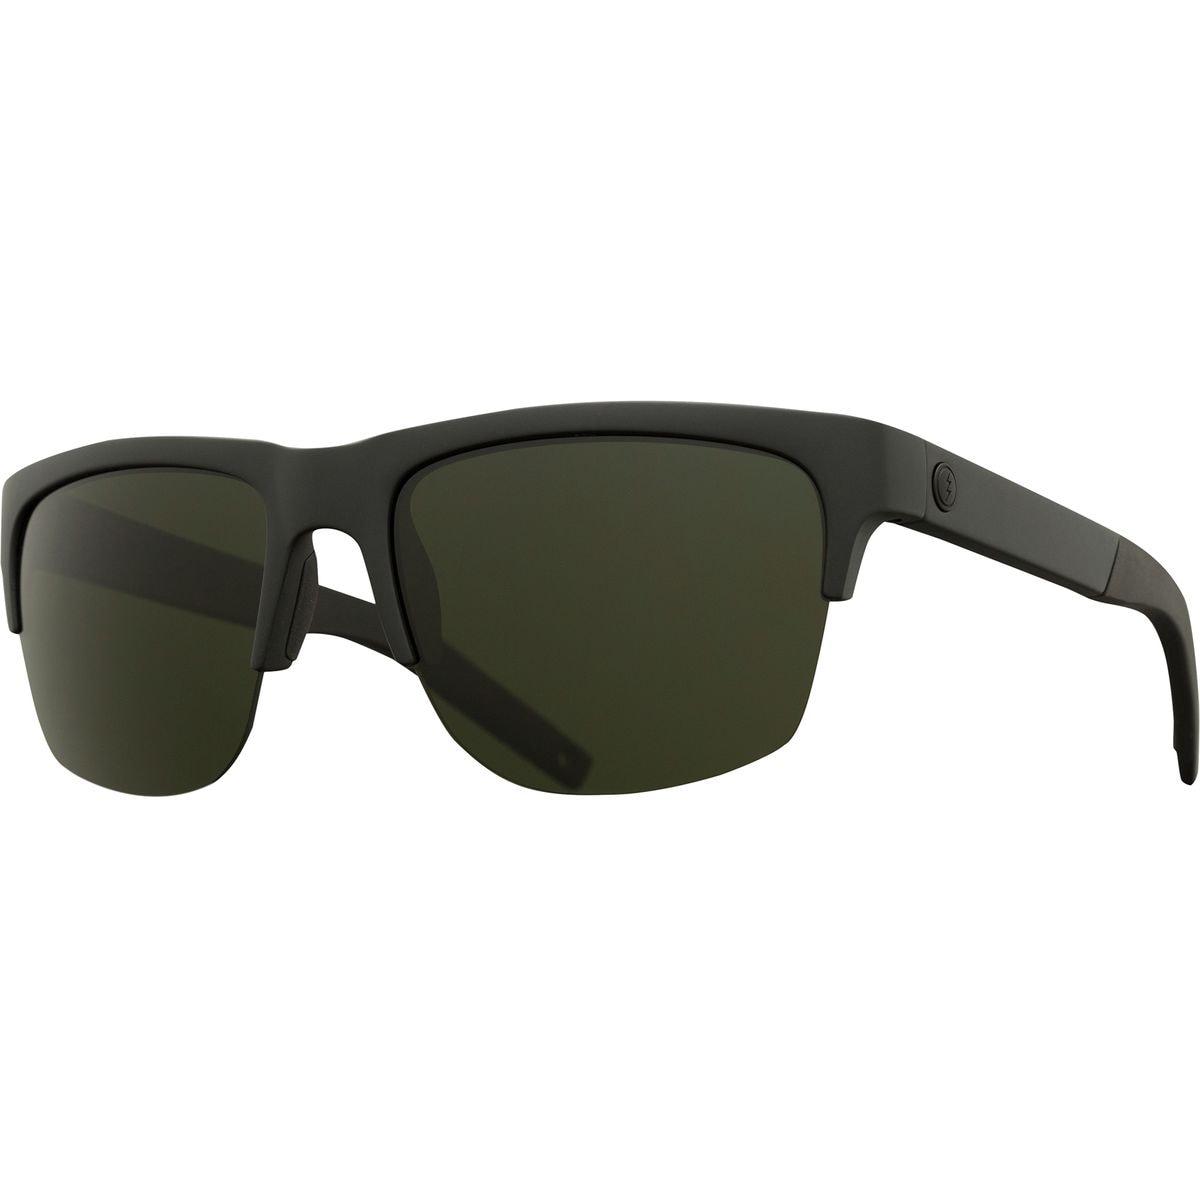 Electric Knoxville Pro Sunglasses - Men's